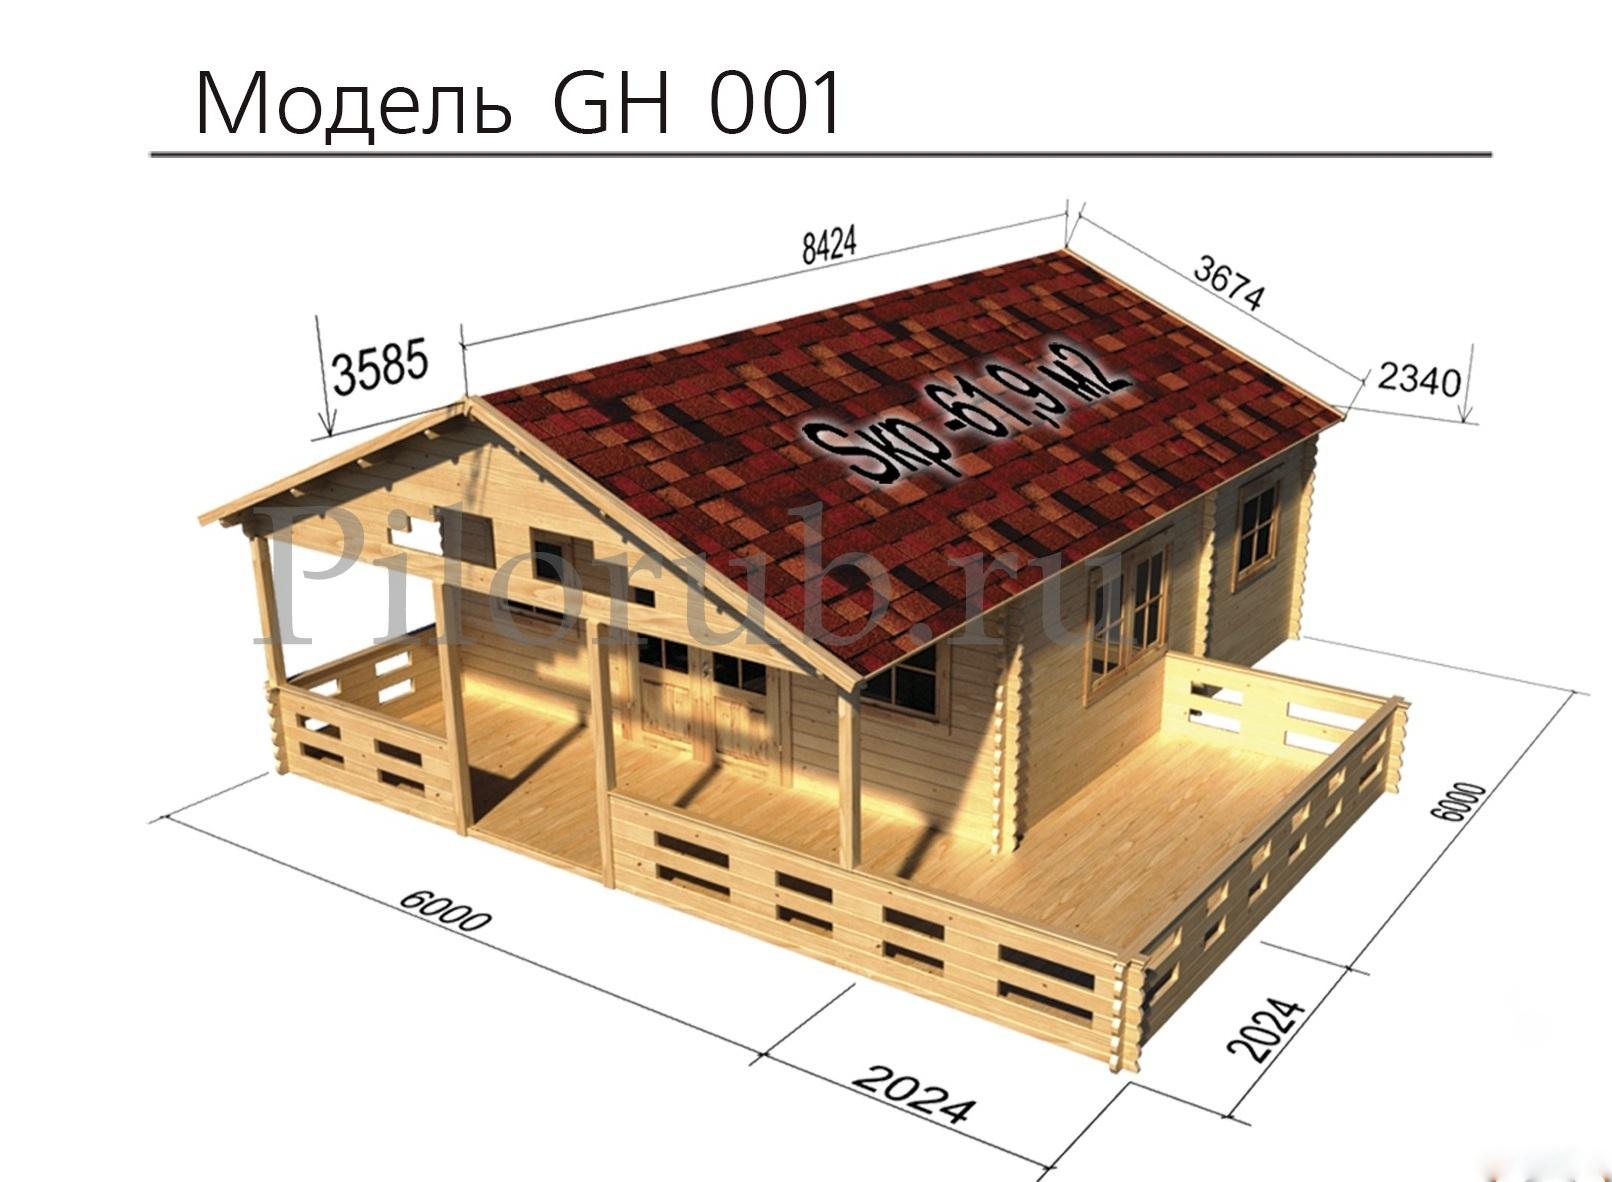 GH001